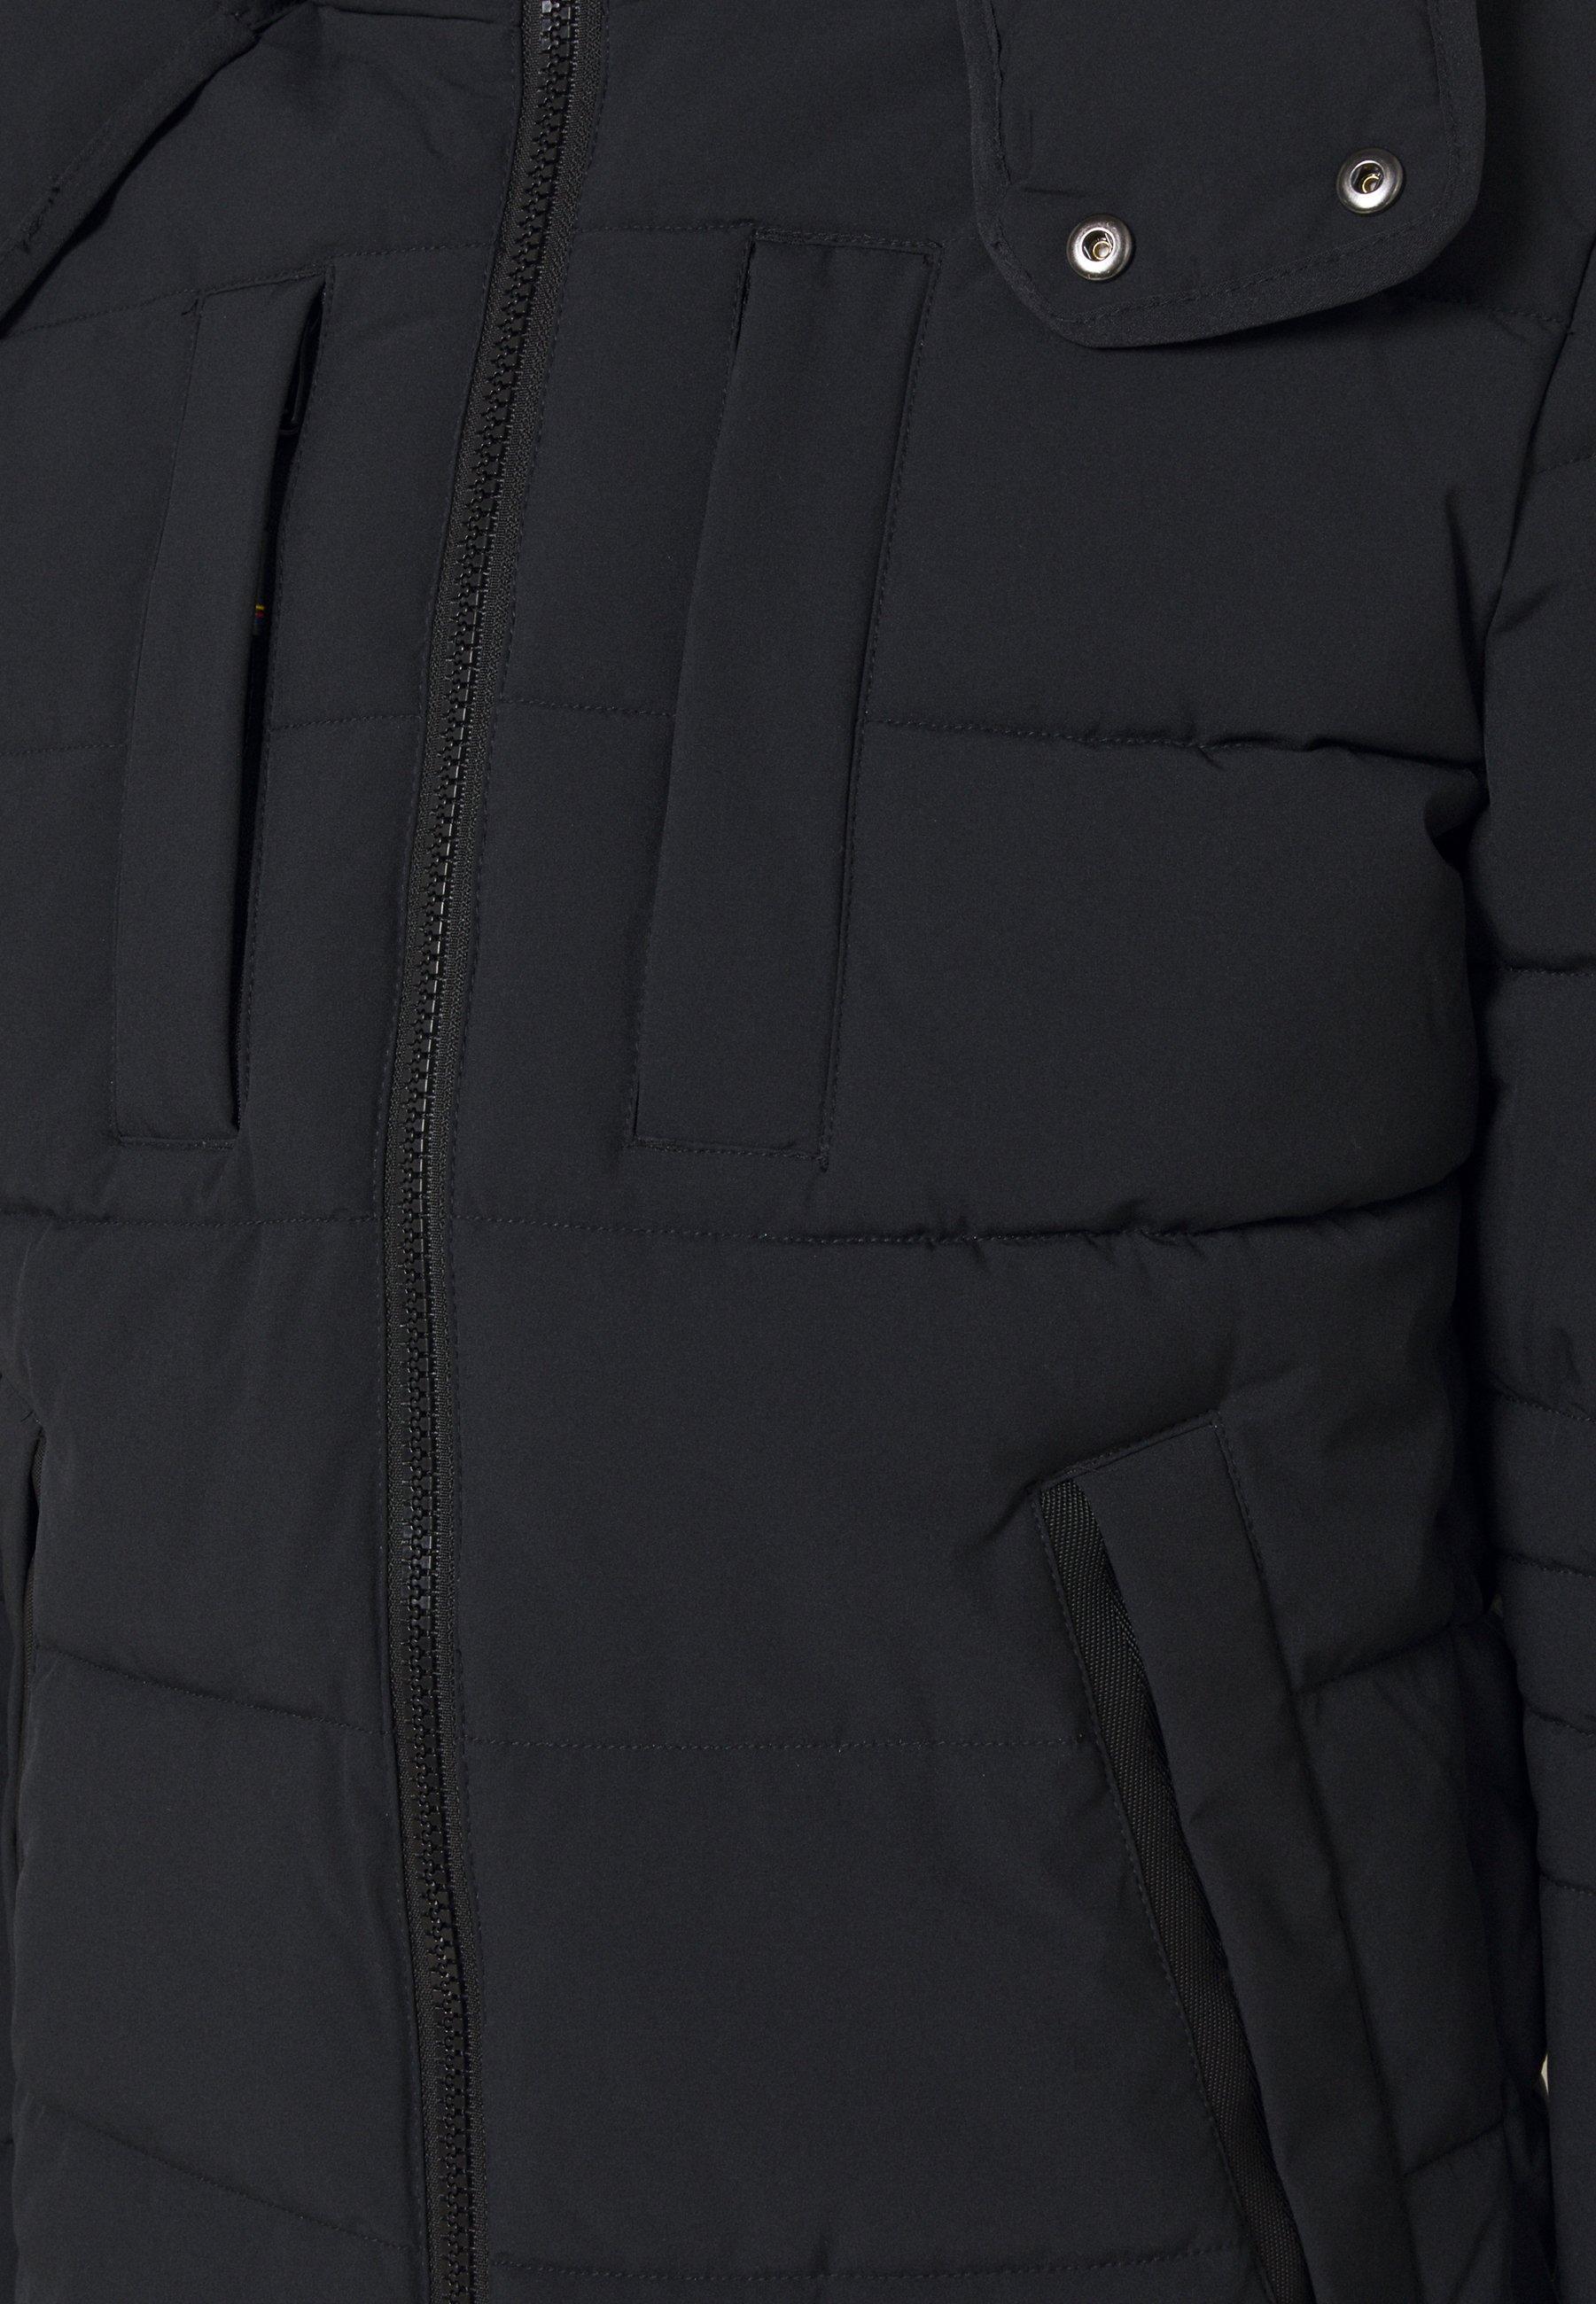 Esprit Vinterjakke - Black/svart